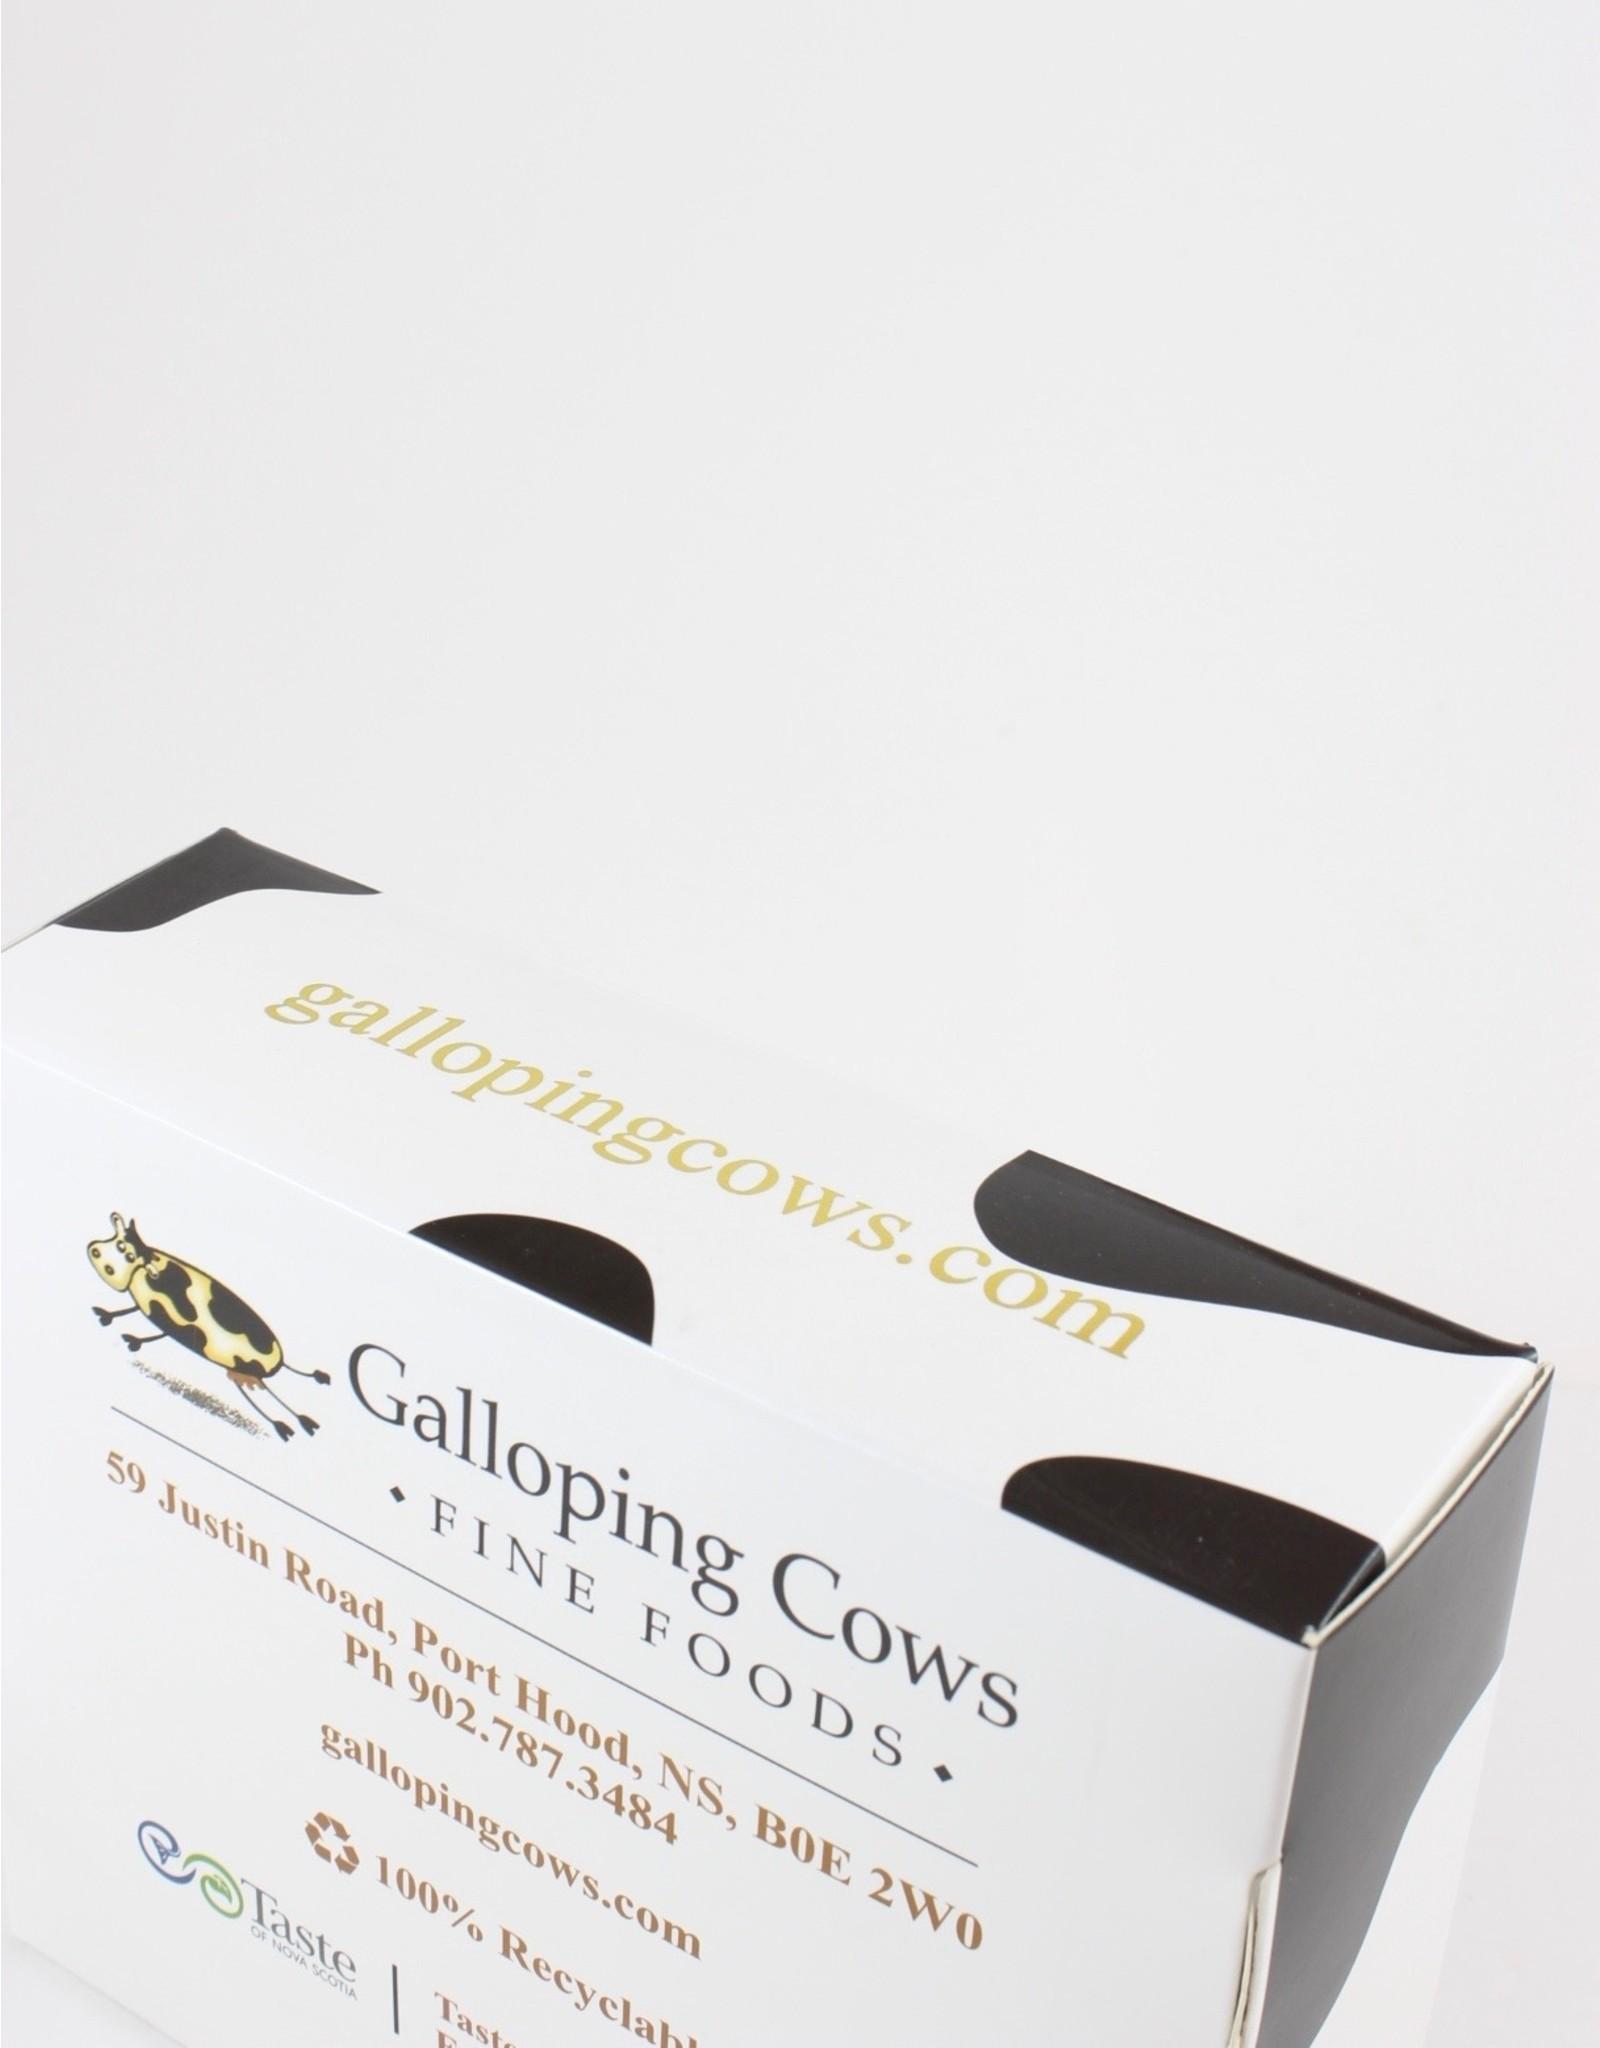 Joanne Schmidt Oscar Pack (6) by Galloping Cows